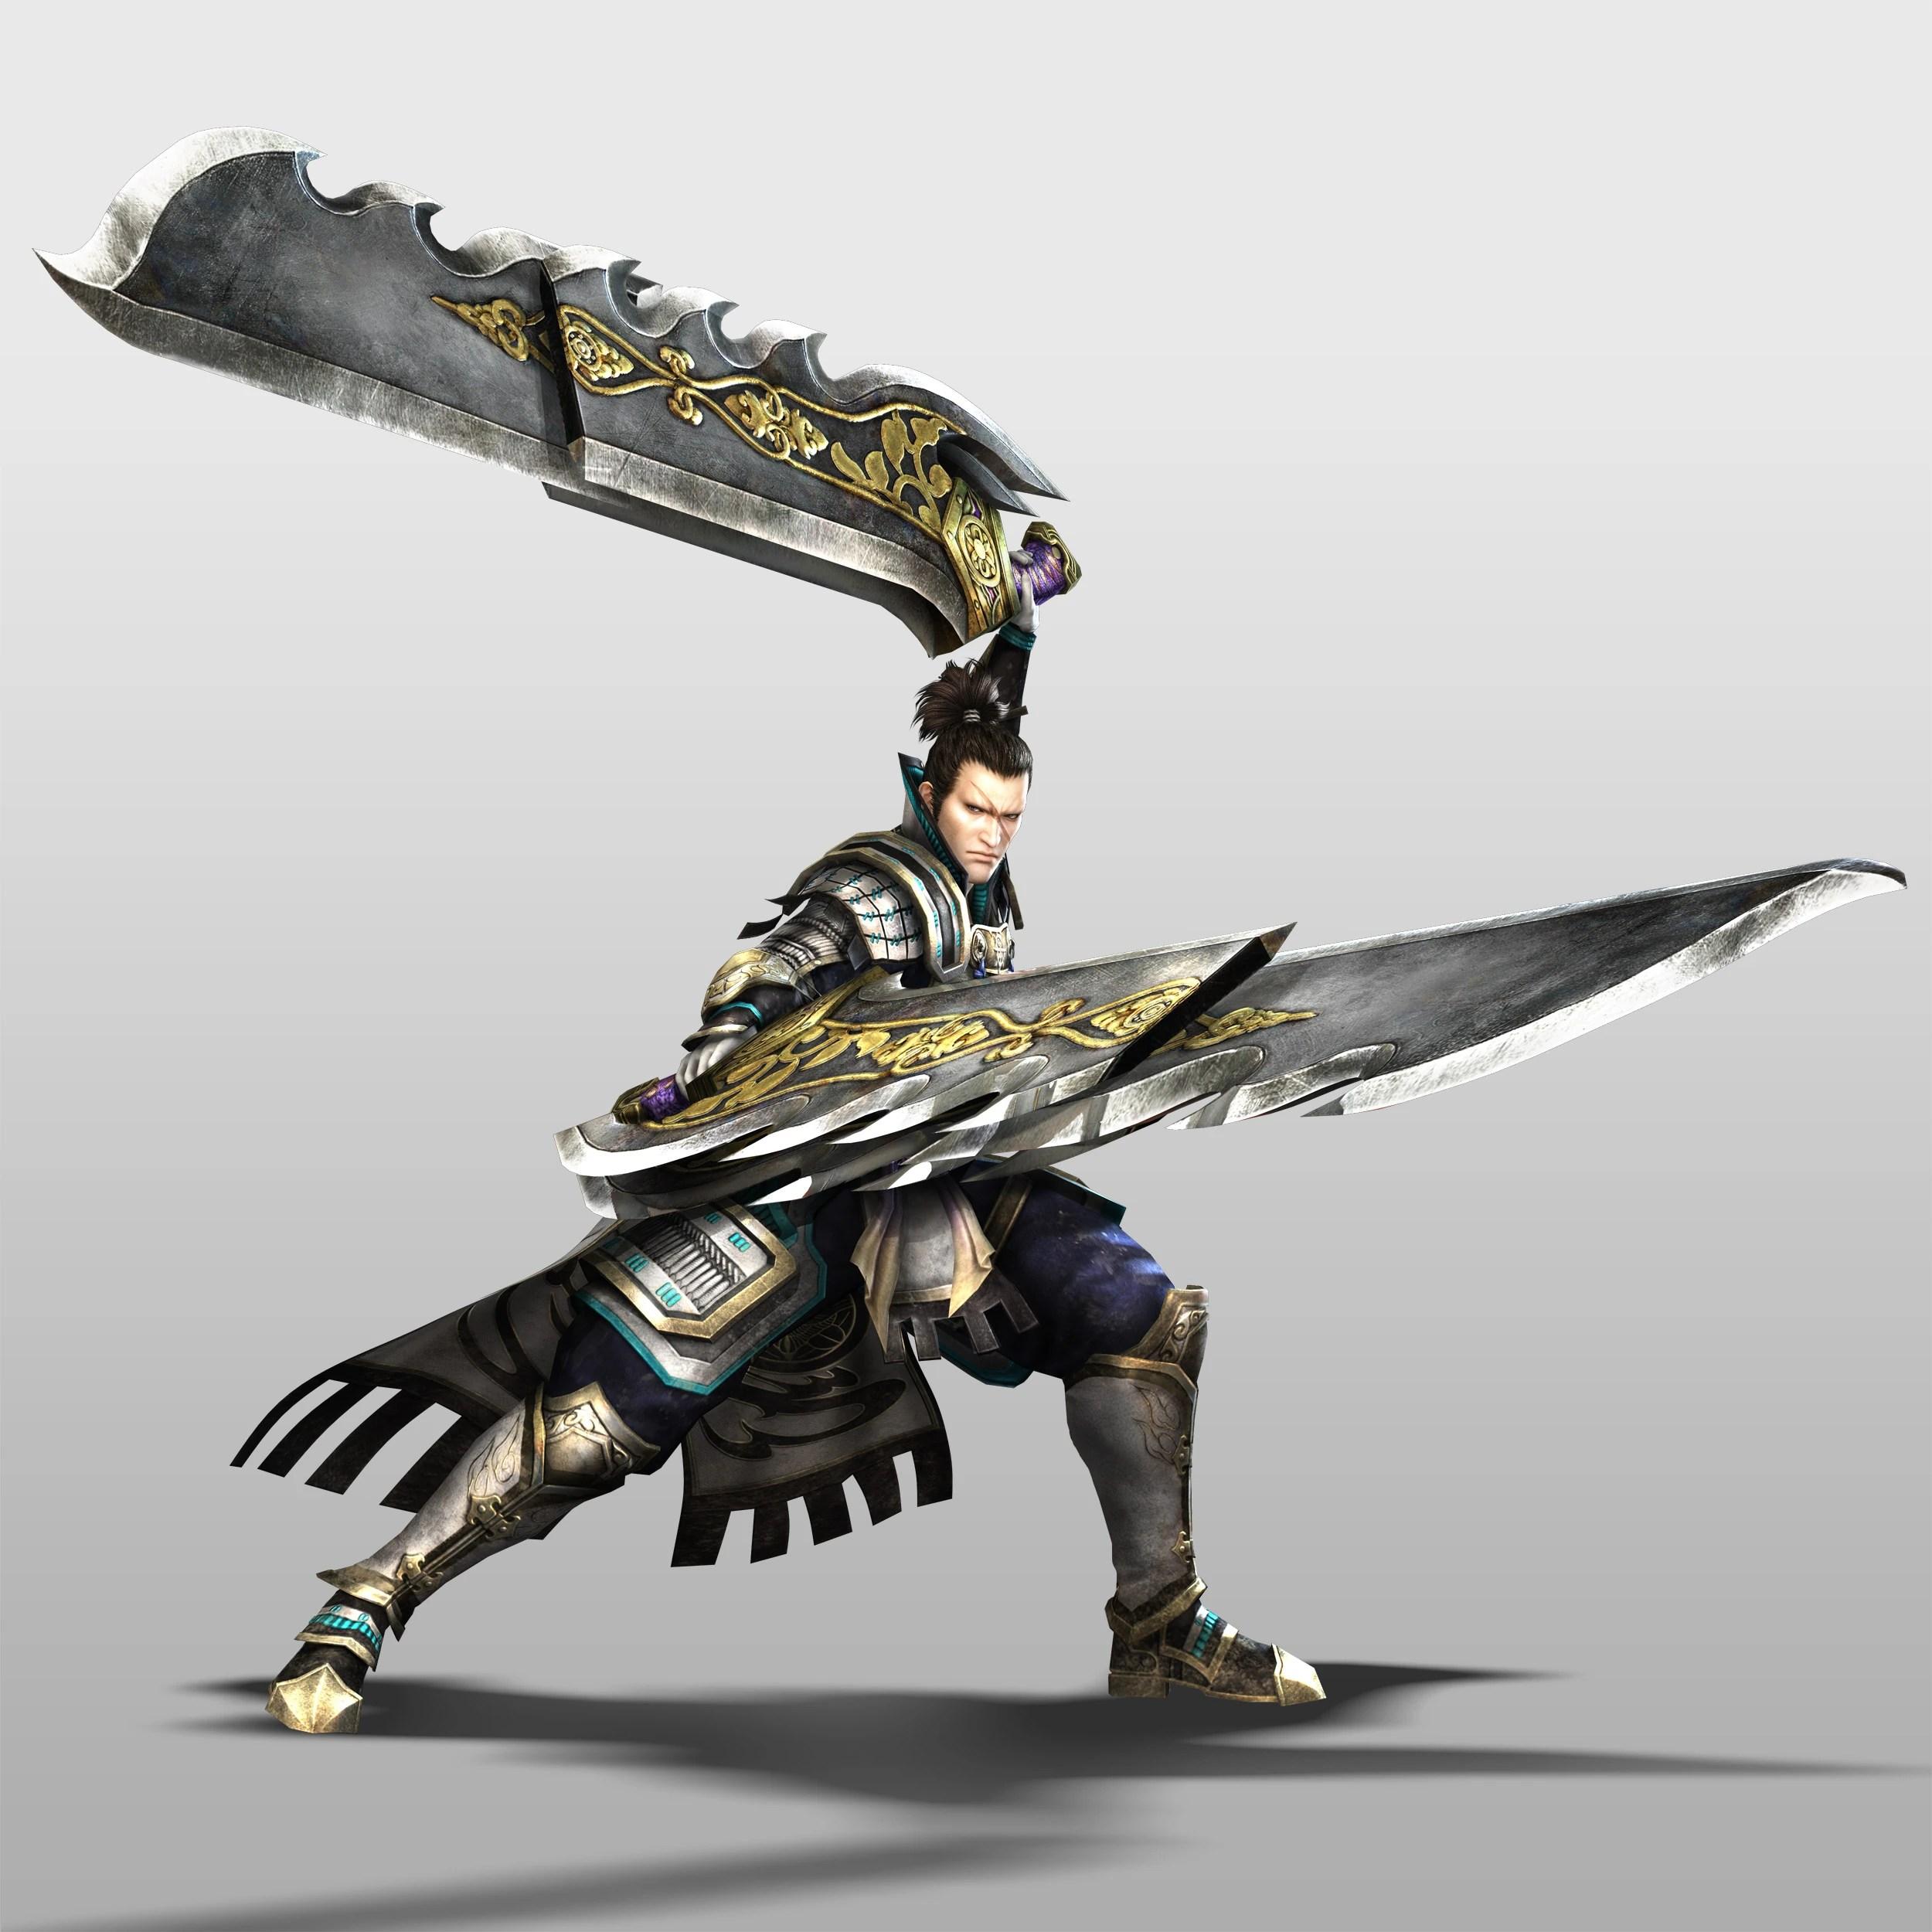 Kagekatsu Uesugi  The Koei Wiki  Dynasty Warriors